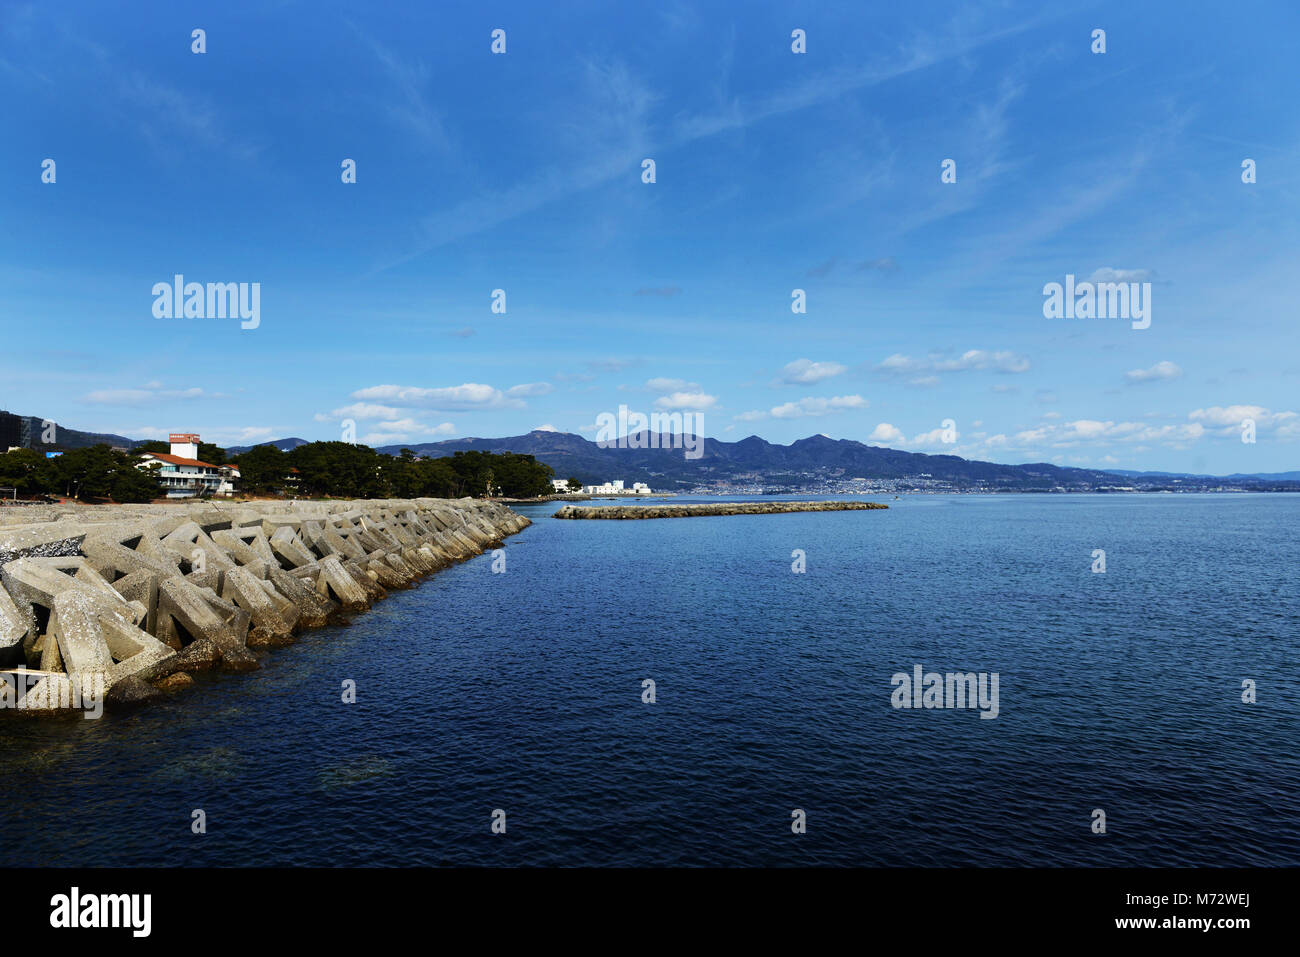 A scenic coastline view in Beppu, Japan. - Stock Image